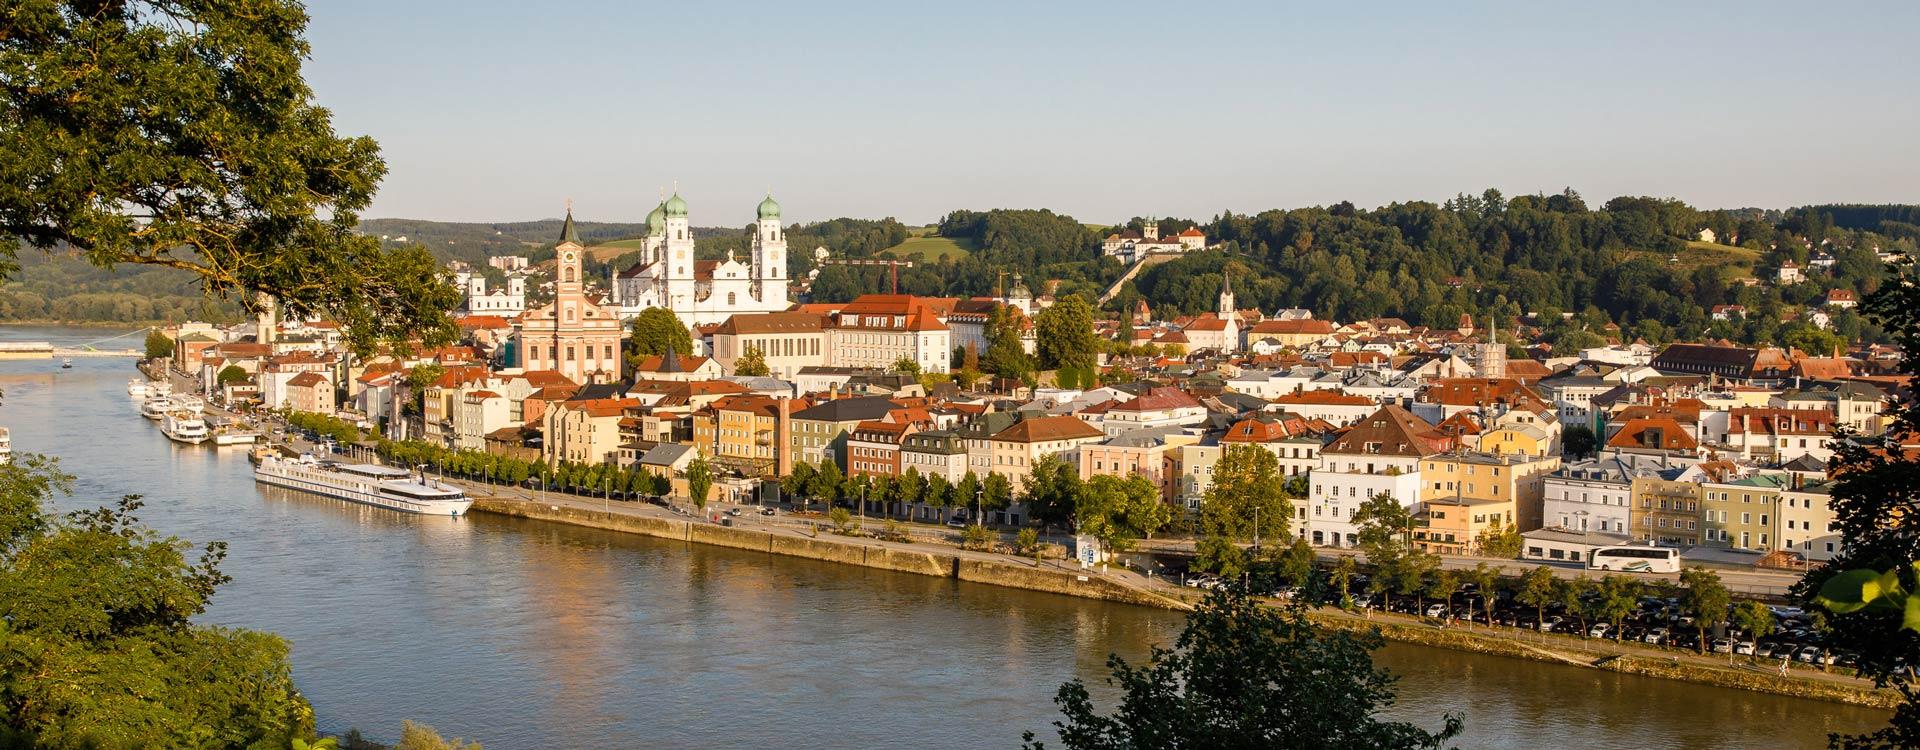 Rechtsanwalt Biber und Rechtsanwalt Fischer in Passau